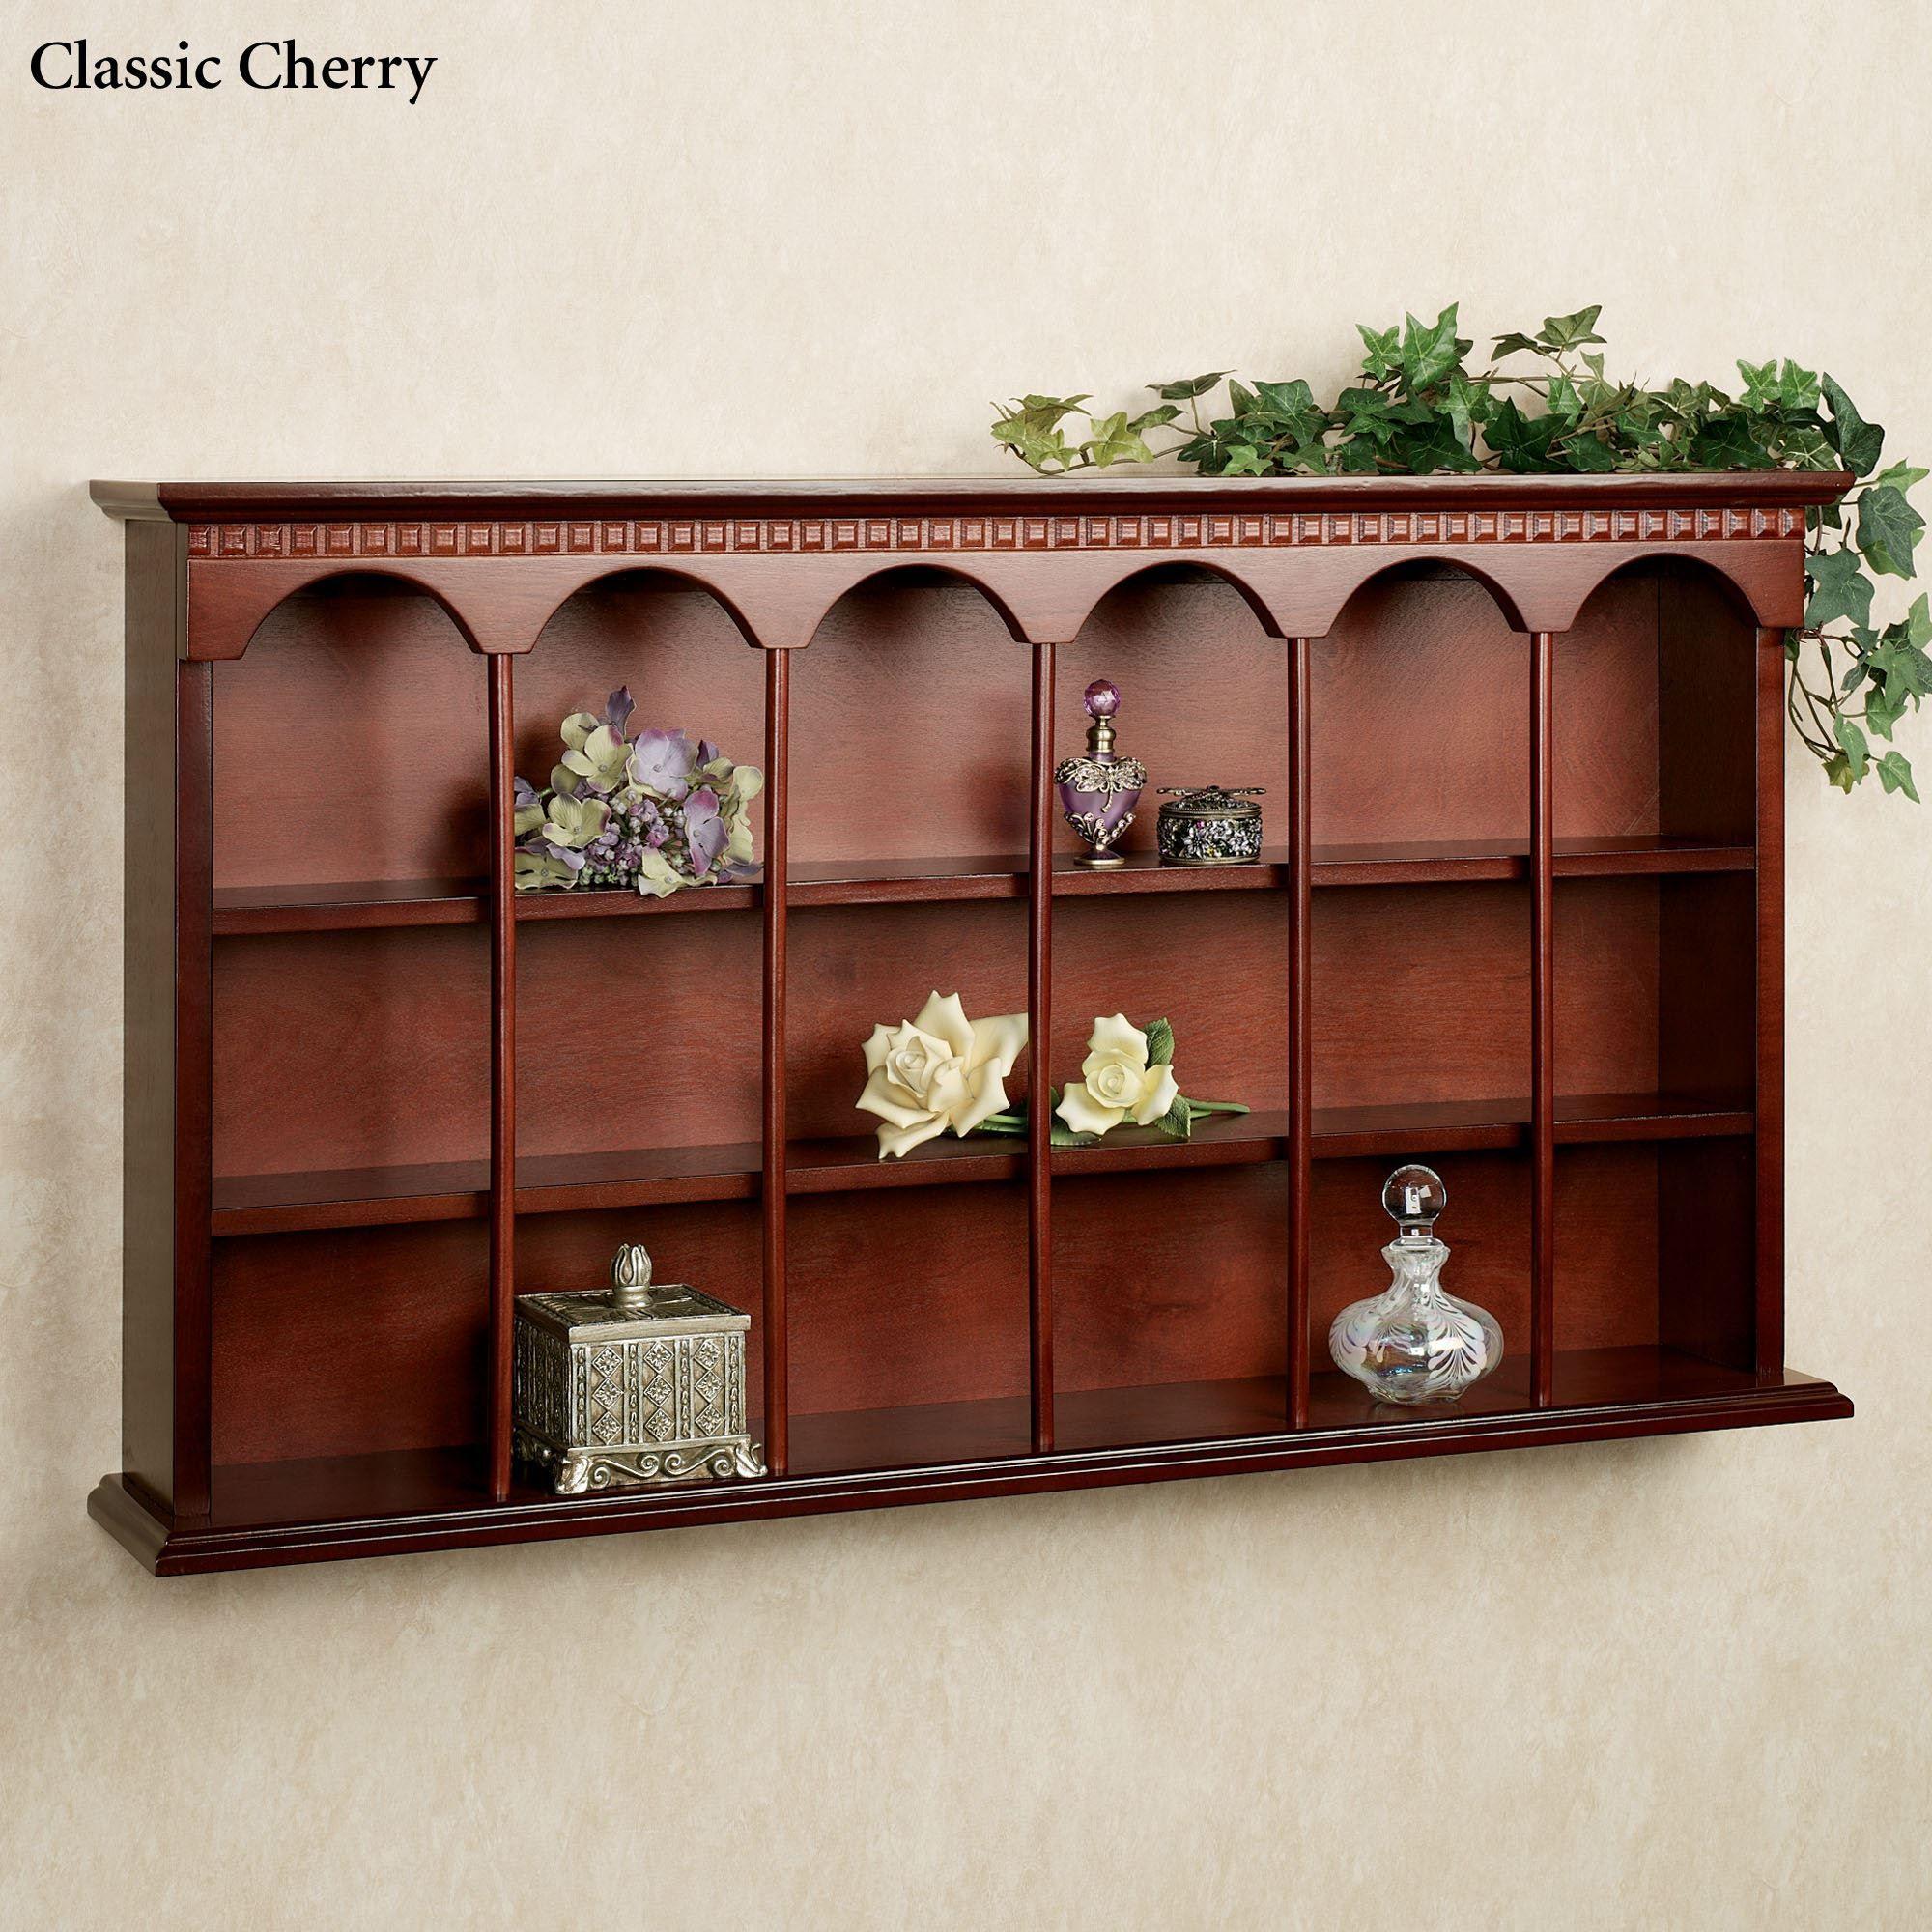 Kitchen Shelf Display: MacKenzie Wooden Wall Curio Display Shelf